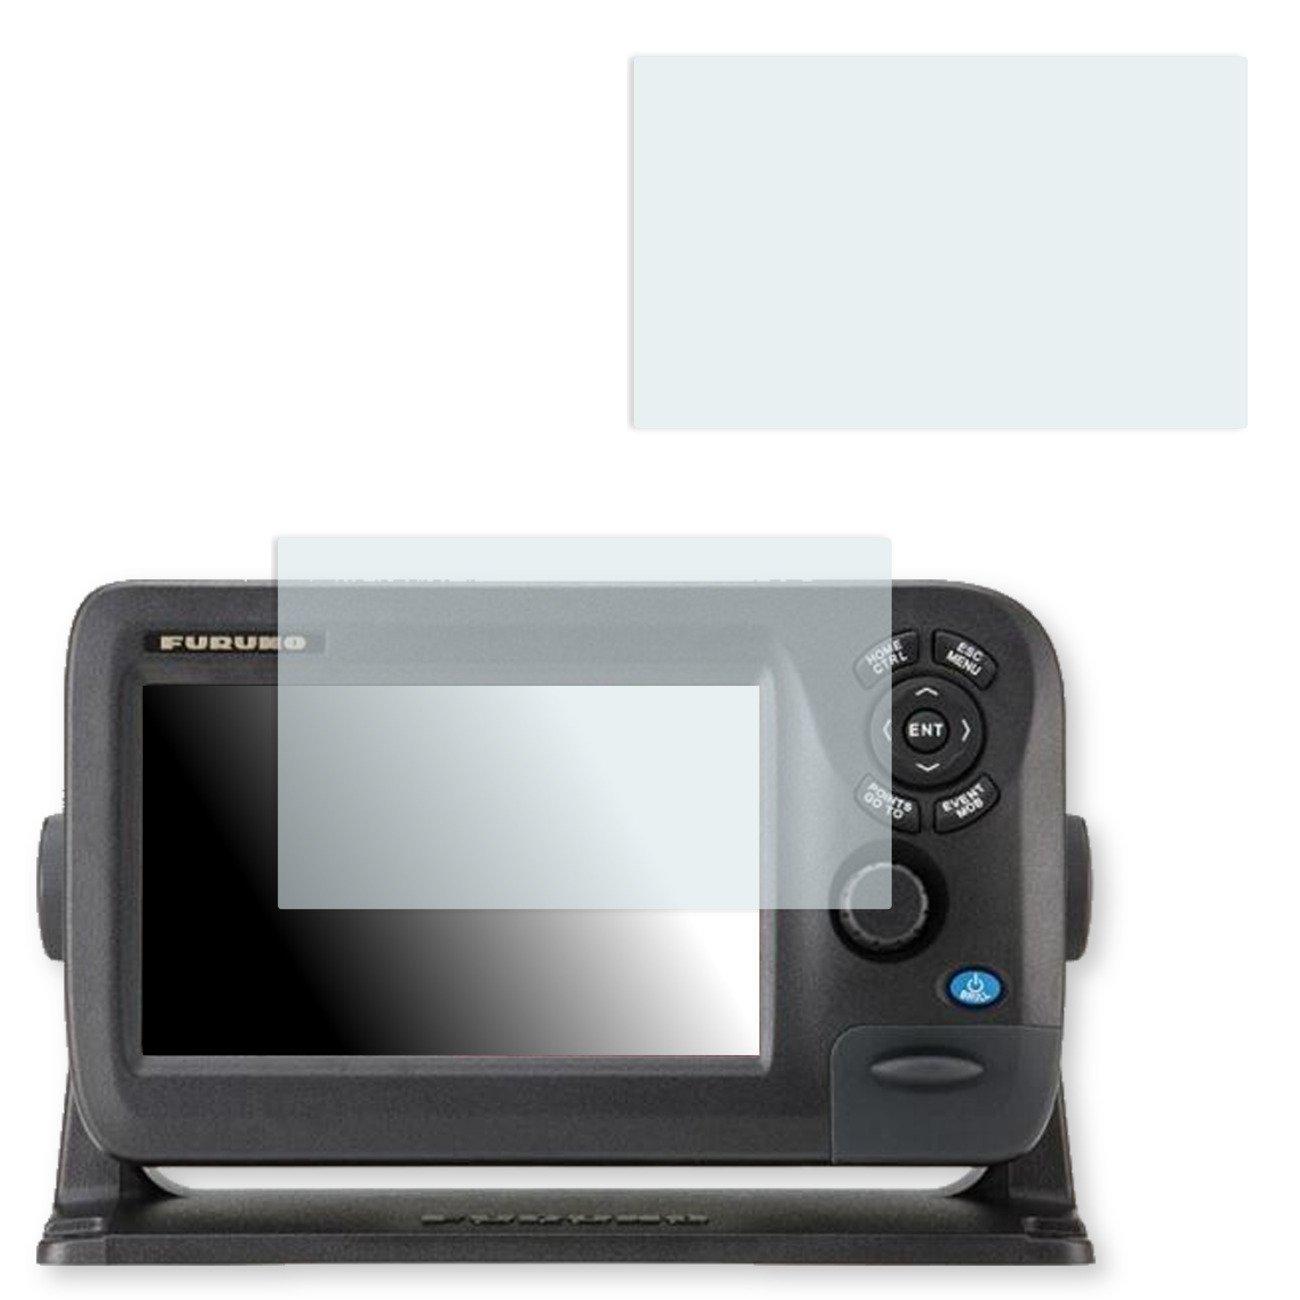 GOLEBO 2X Anti-Glare Screen Protector for Furuno GP-1870F (Anti-Reflex, Air Pocket Free Application, Easy to Remove)